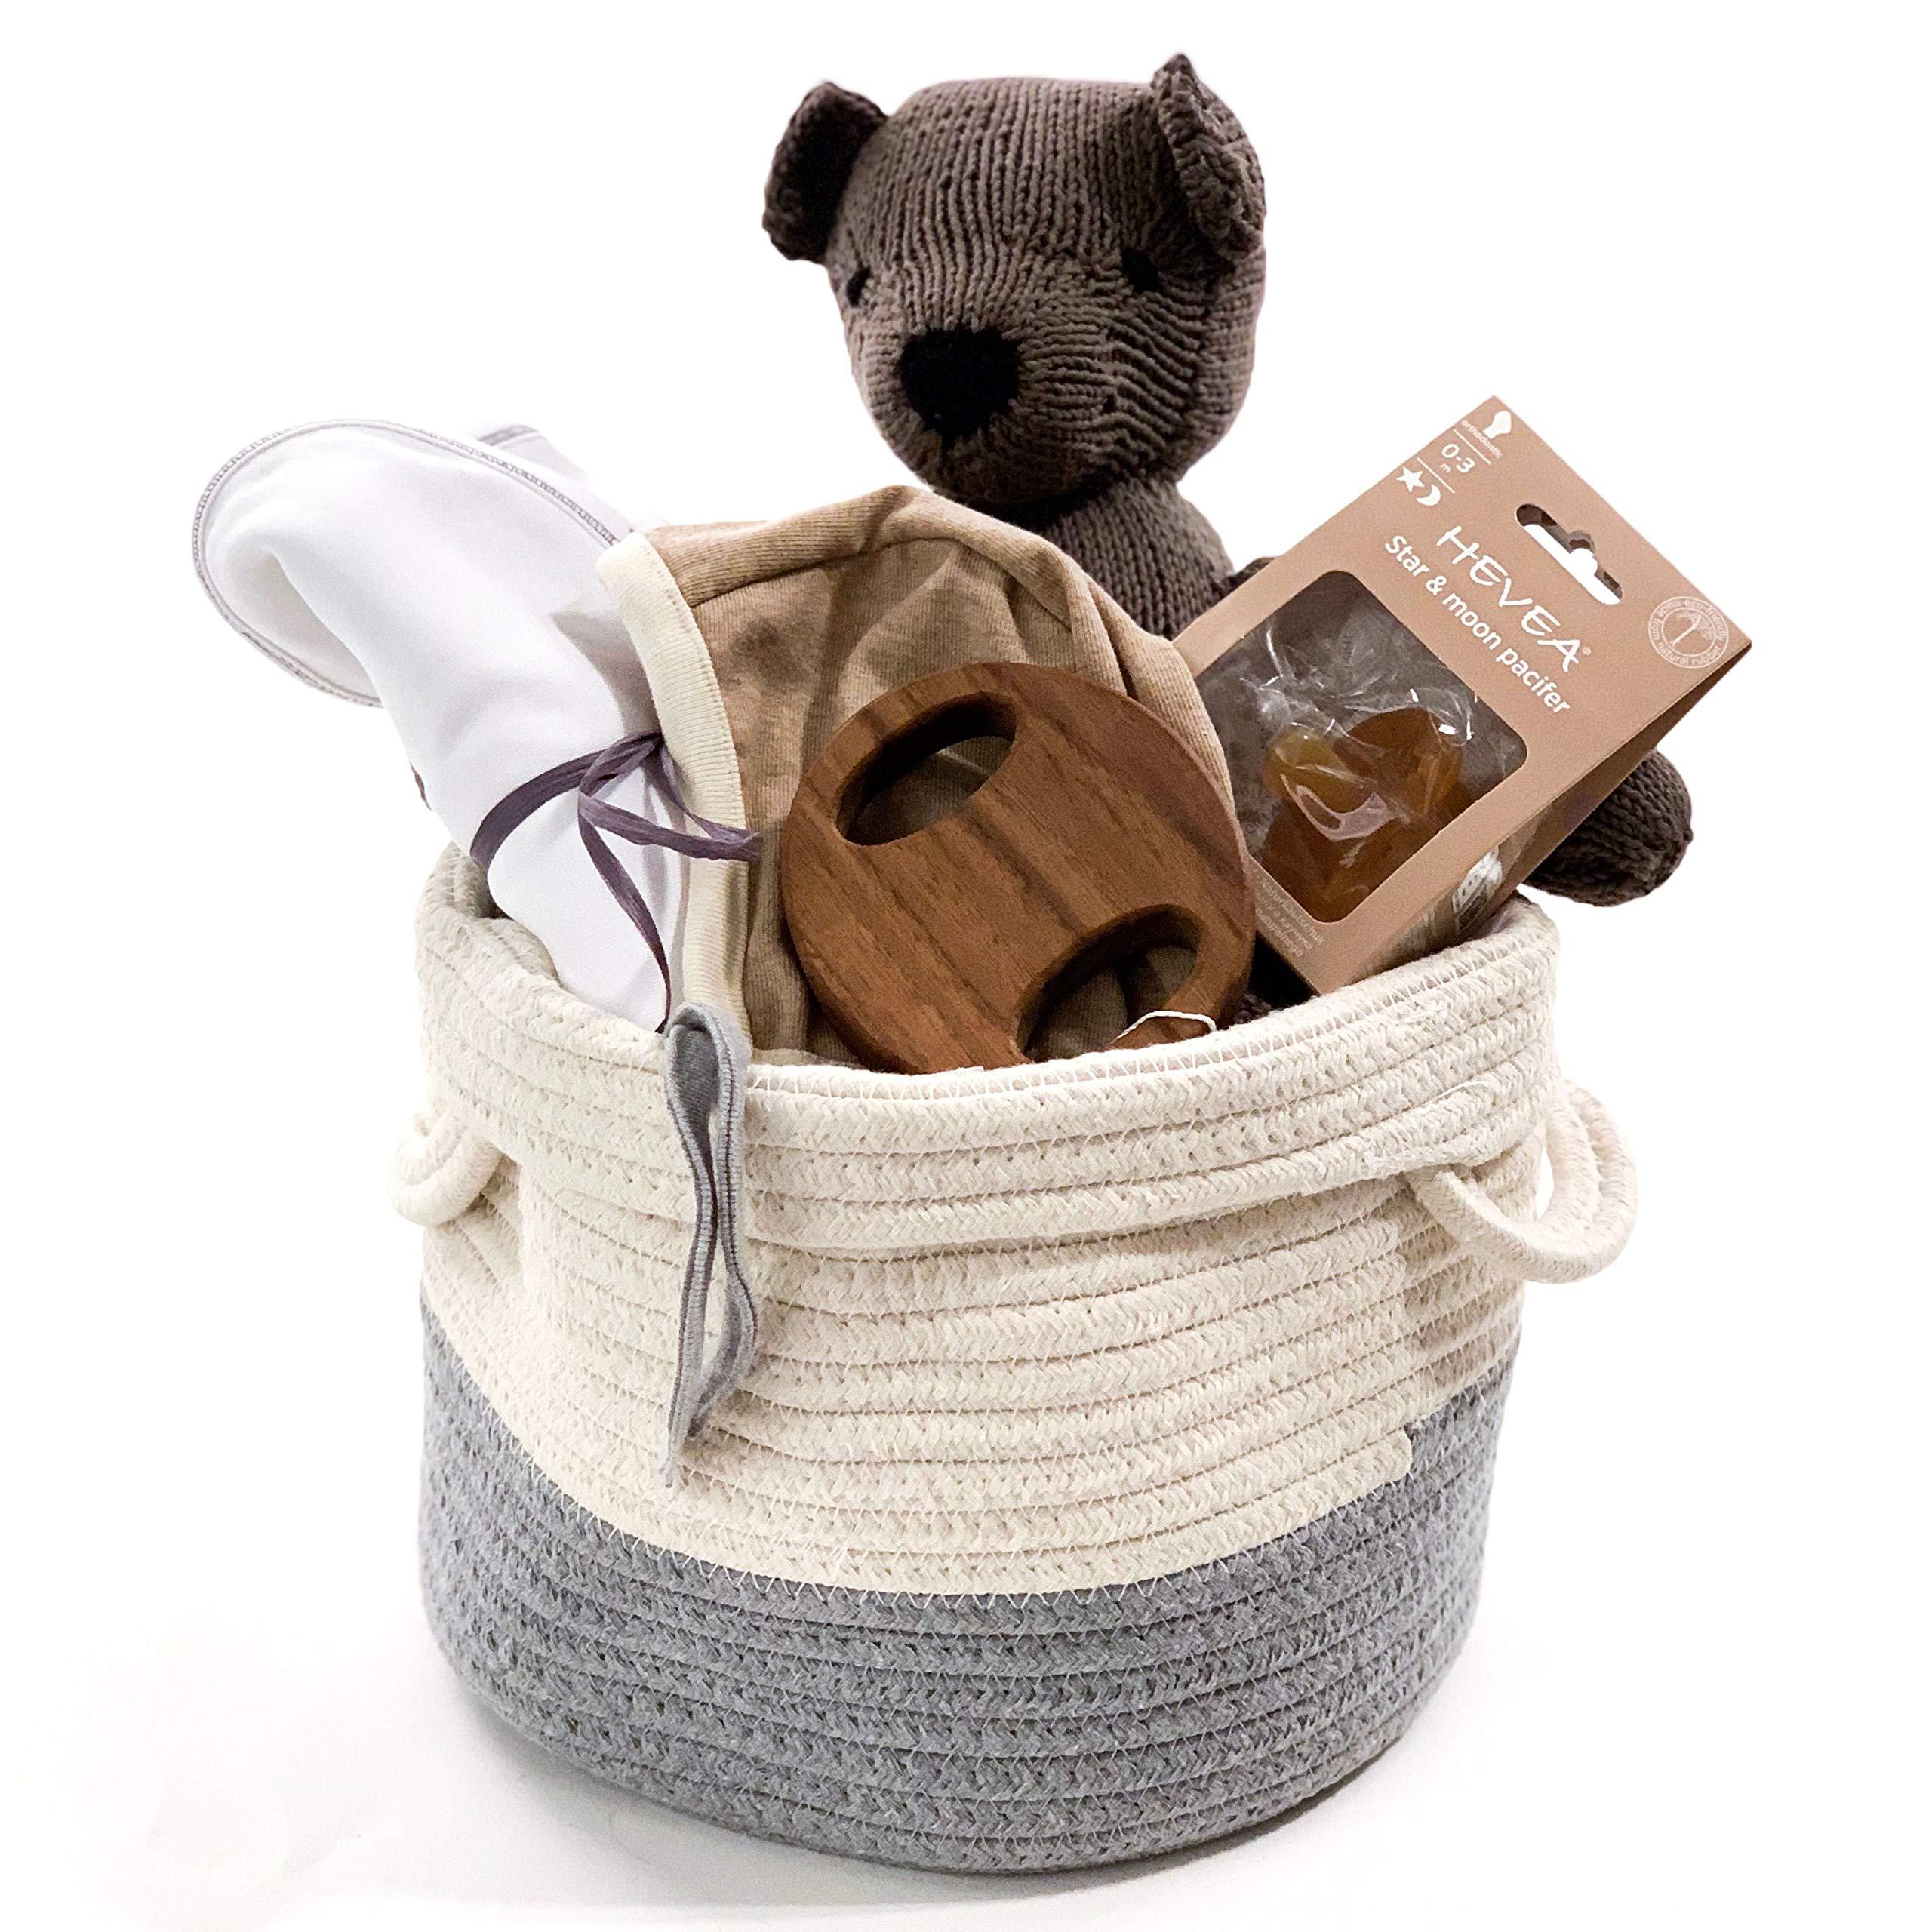 Organic Baby Gift Basket - Tan & Gray Baby Shower - Unisex, Gender Neutral